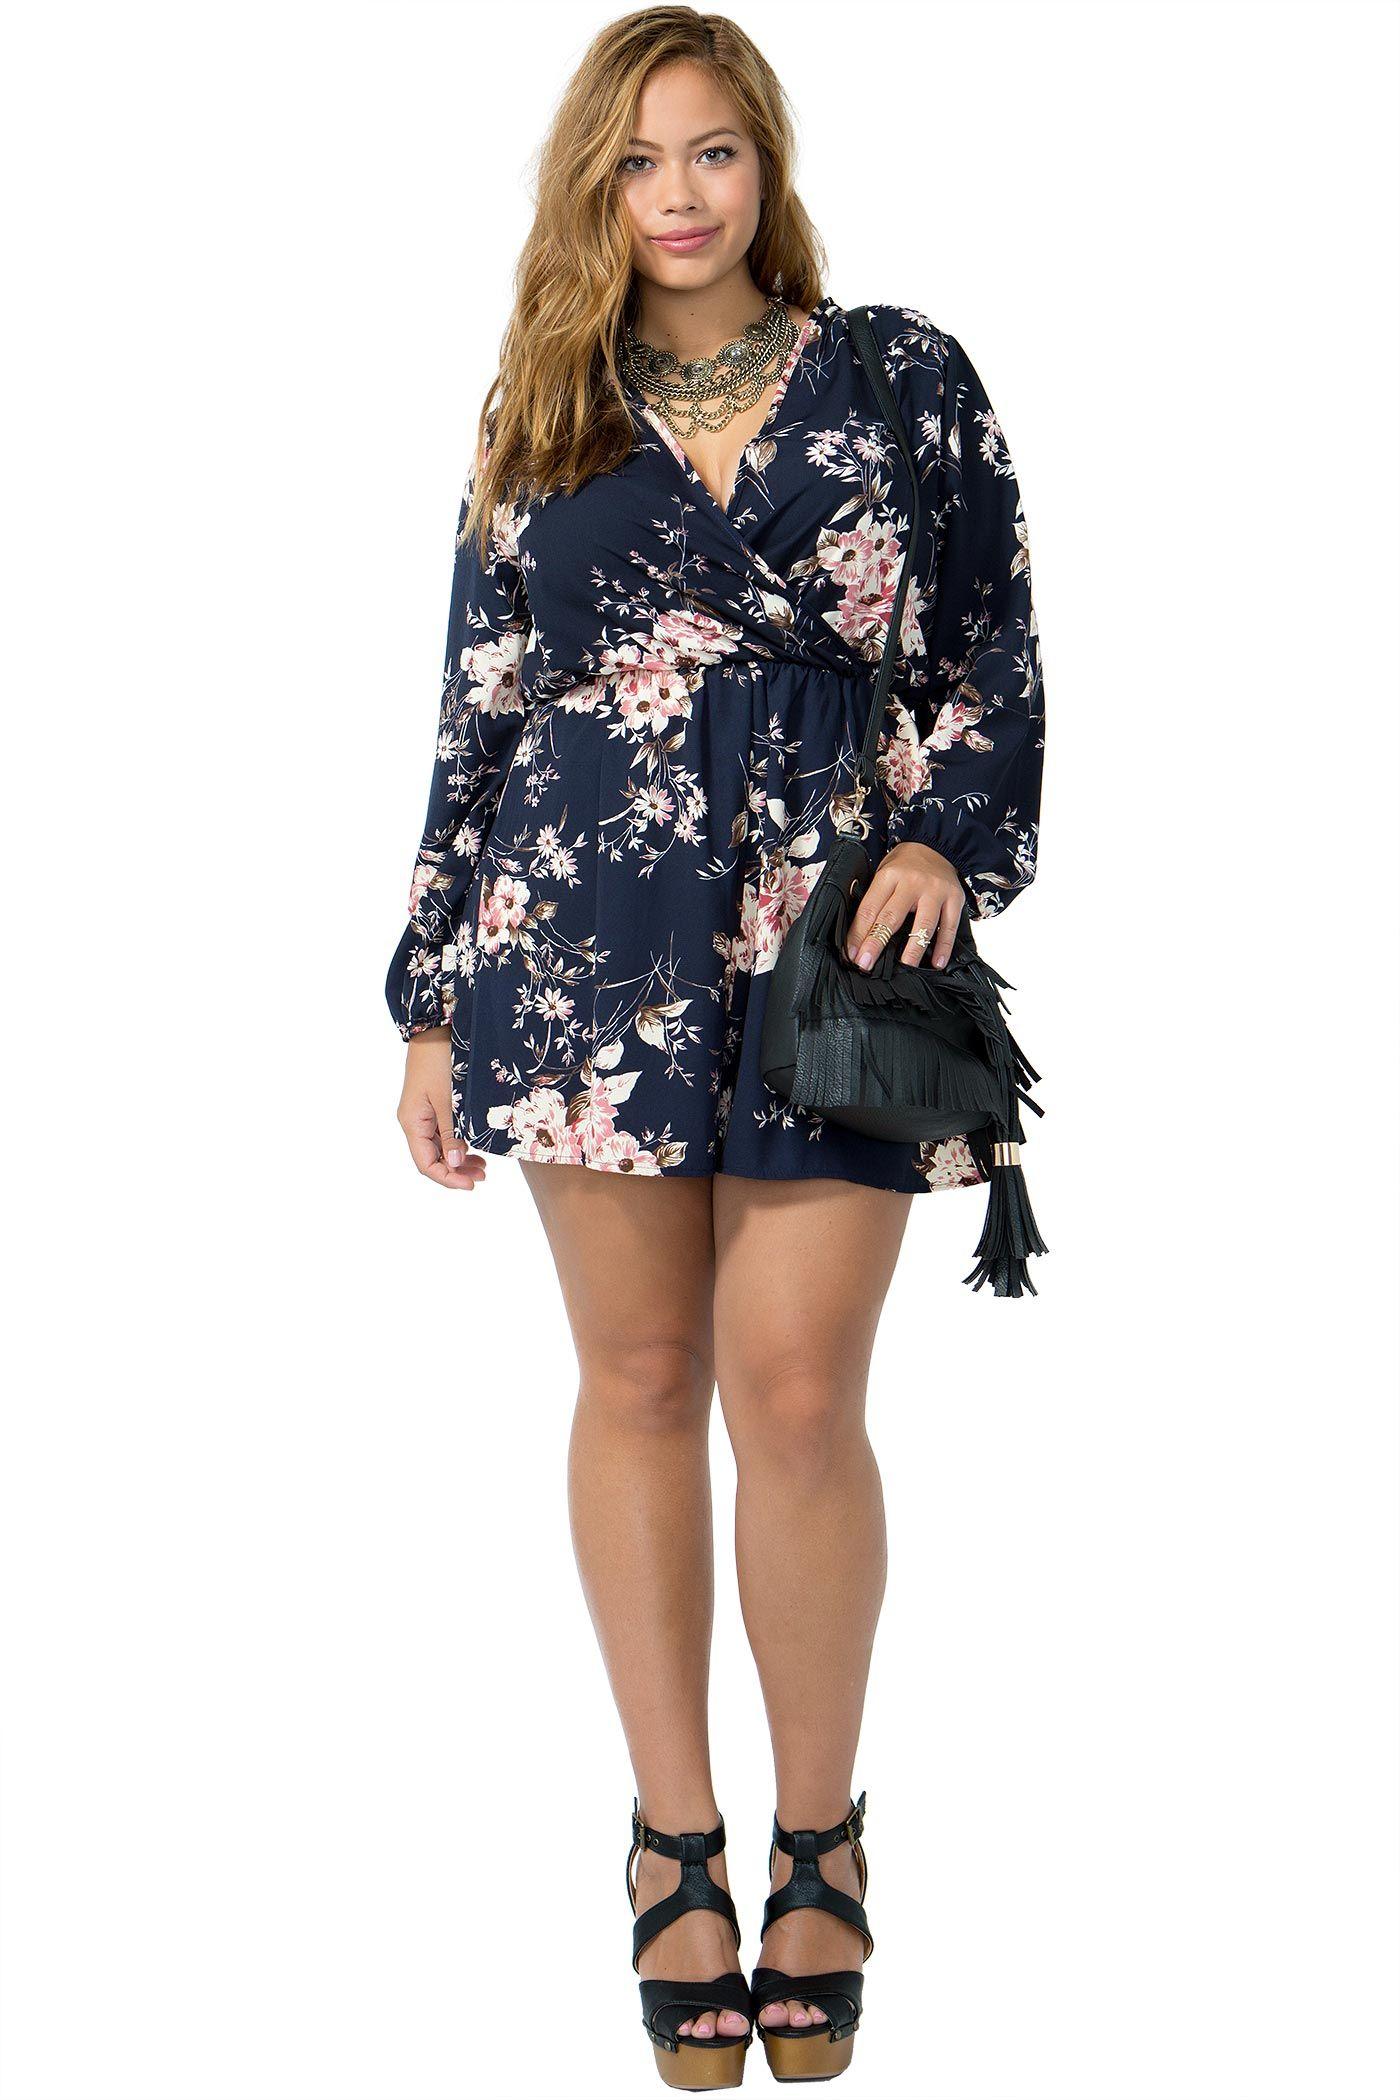 c00054a0577 Women's Plus Size Rompers | Blossom Surplice Romper | A'GACI | Want ...